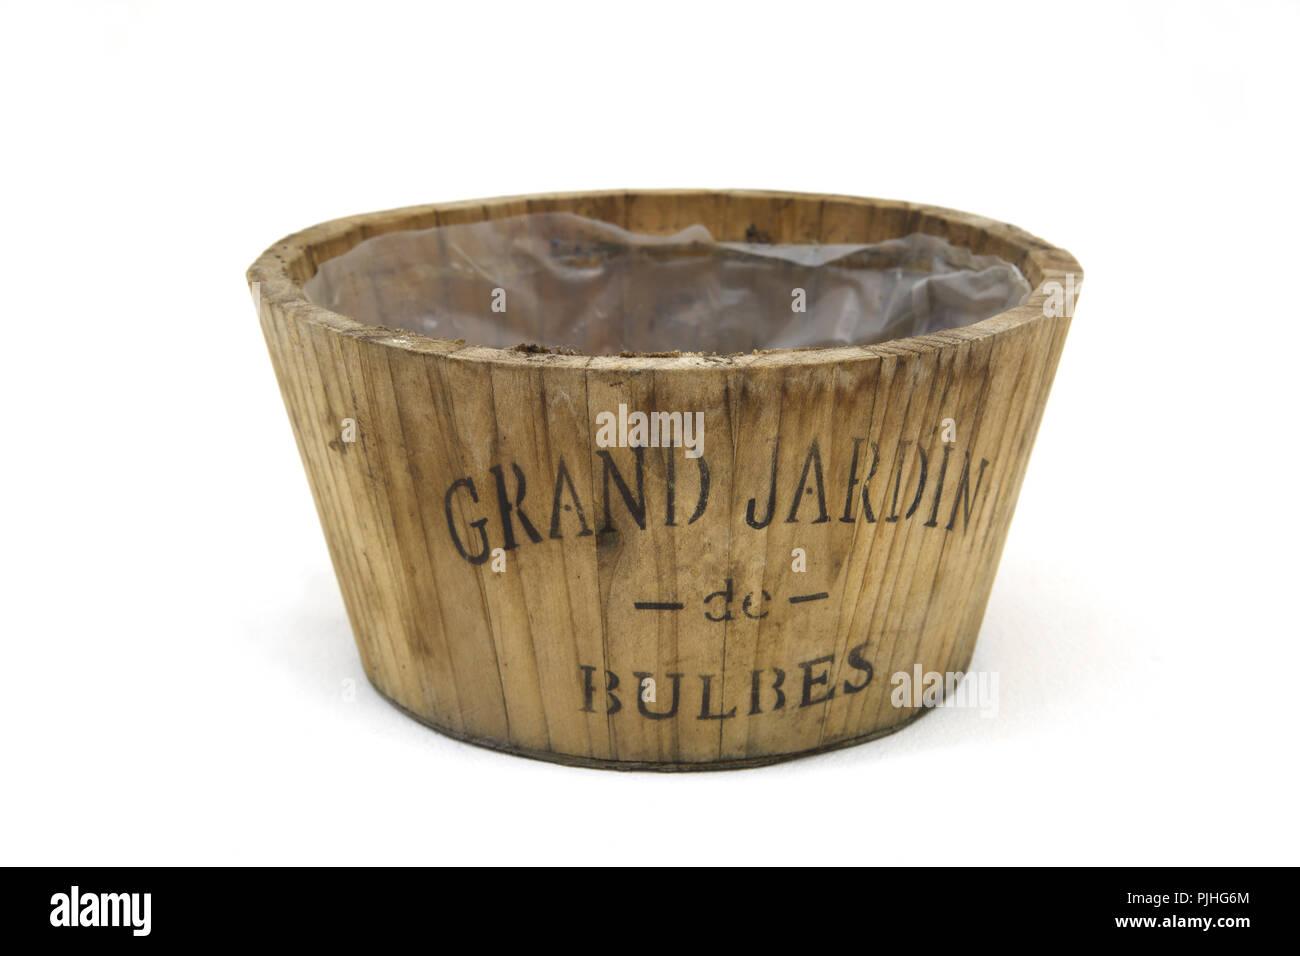 Wooden Pot For Storing Bulbs - Stock Image